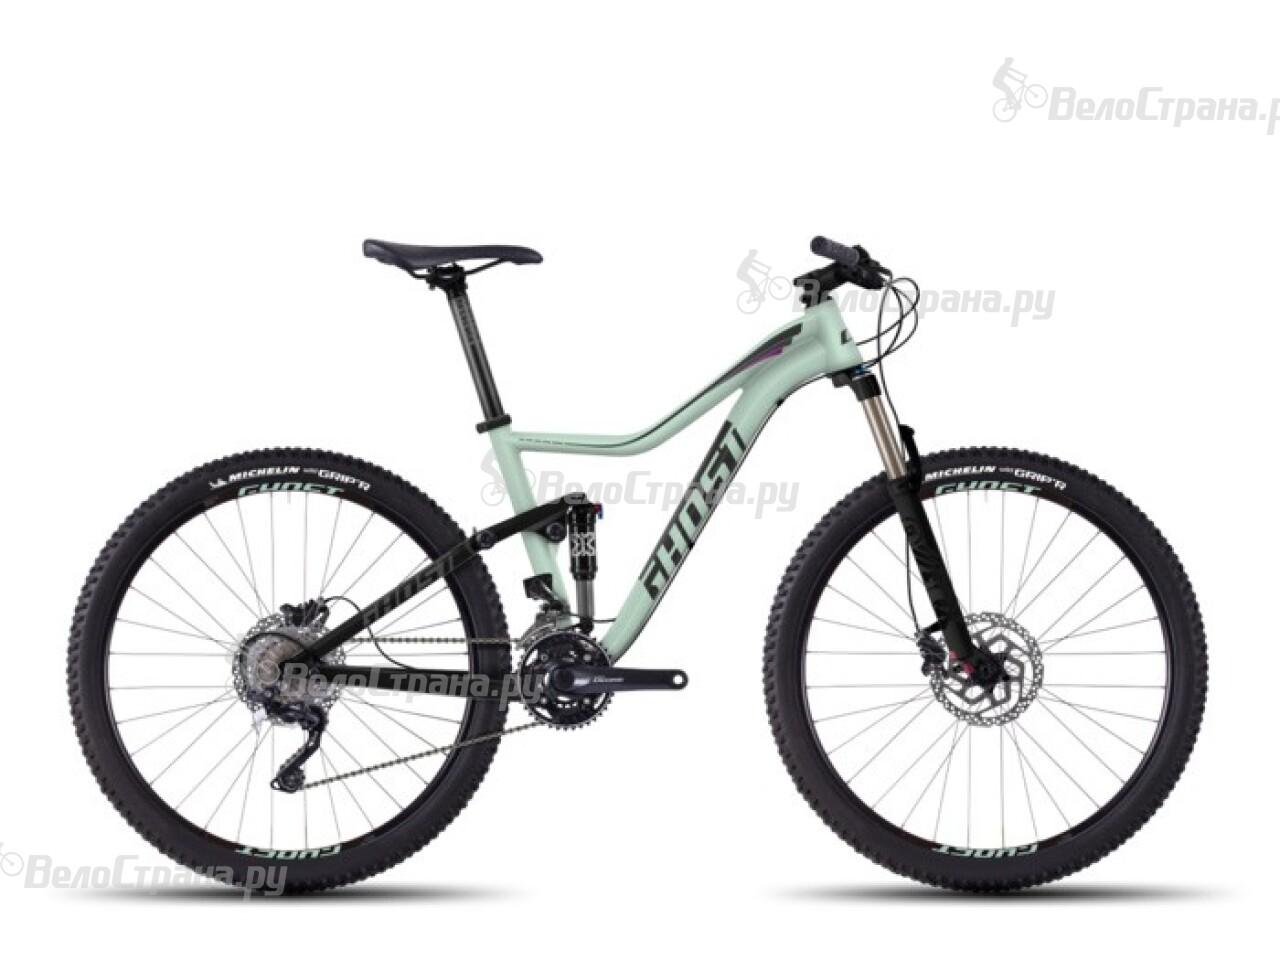 Велосипед Ghost Lanao FS 4 (2016) велосипед challenger mission lux fs 26 черно красный 16